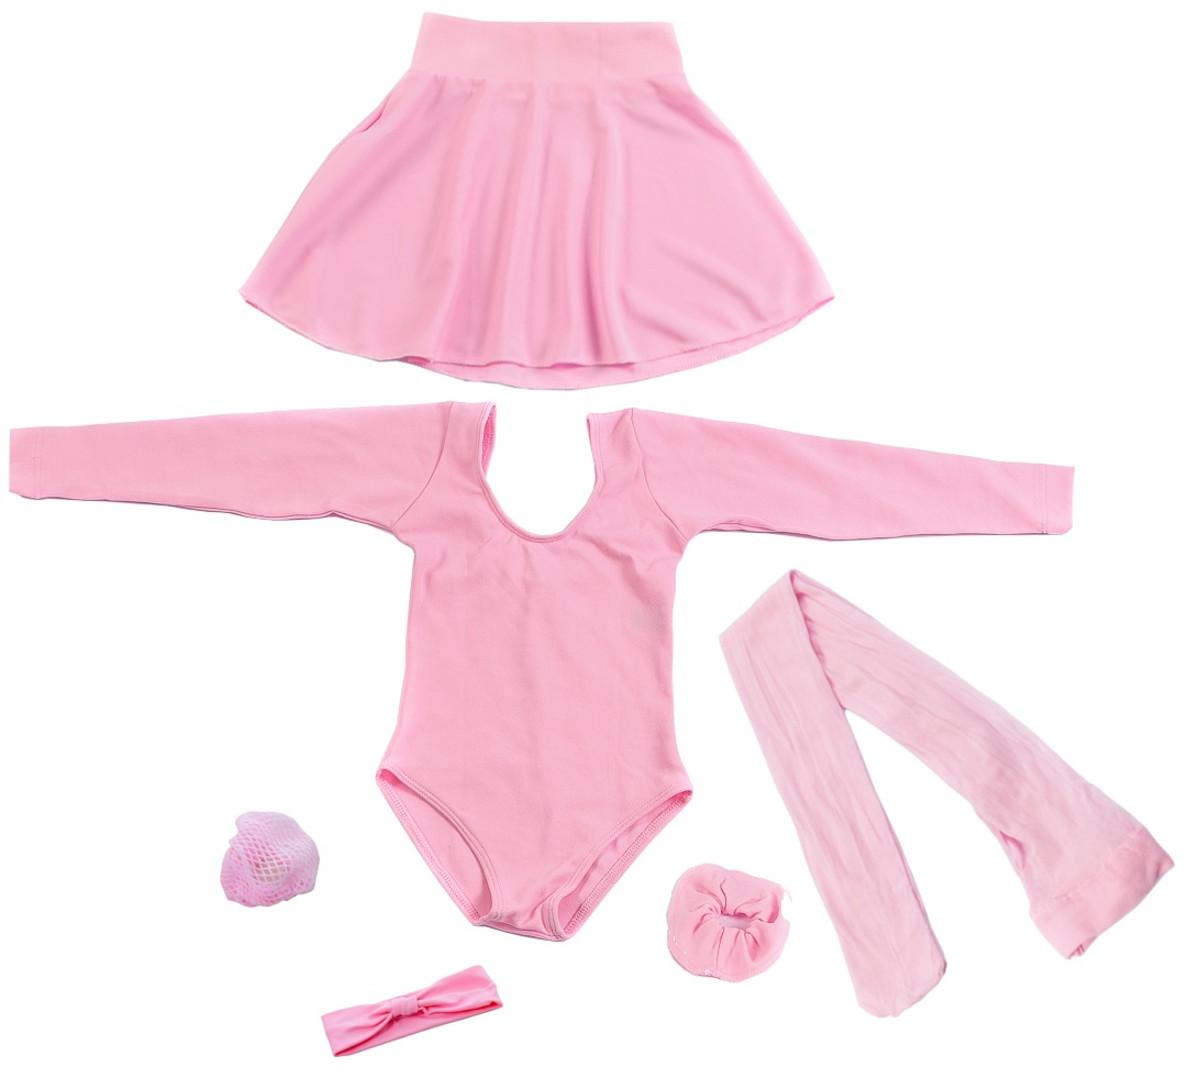 8ff8aa191 kit de Ballet Infantil Manga Longa do 2 ao 6 no Elo7